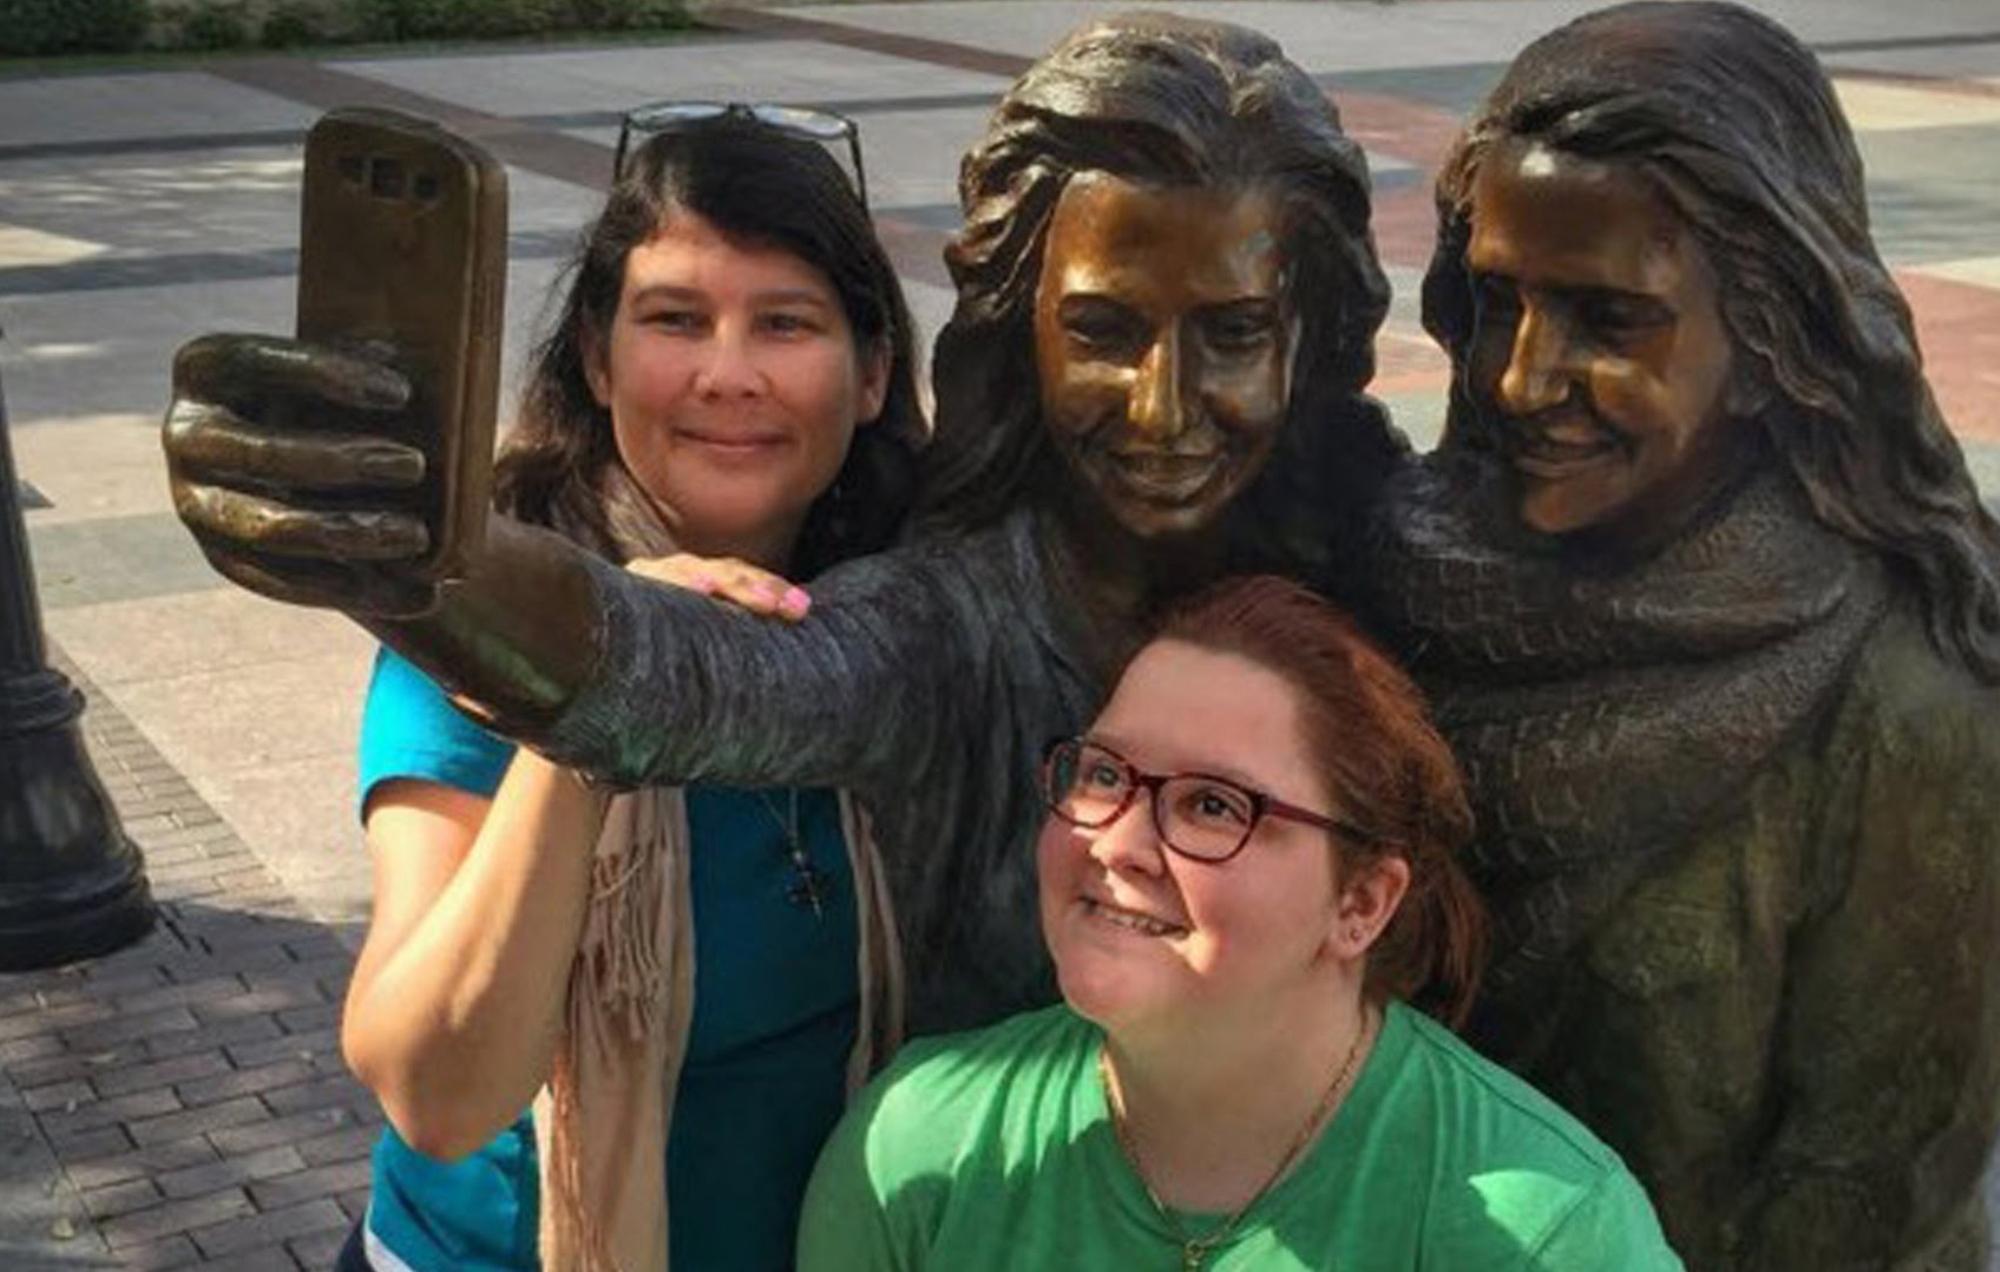 Texas, ecco la statua dedicata ai selfie